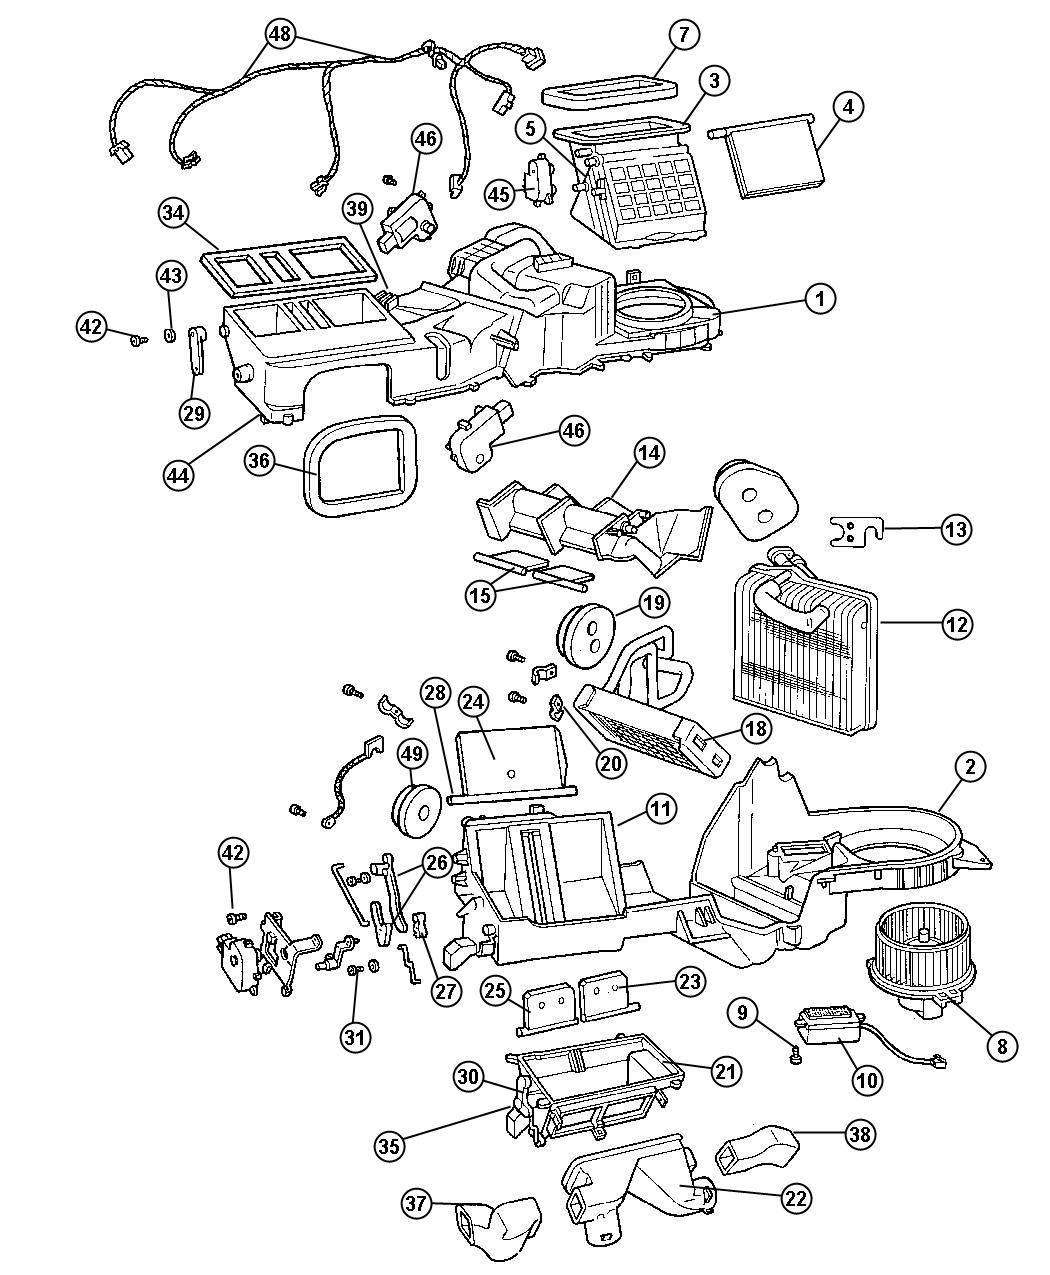 2010 Jeep Wrangler Lever. A/c recirculation door. Air